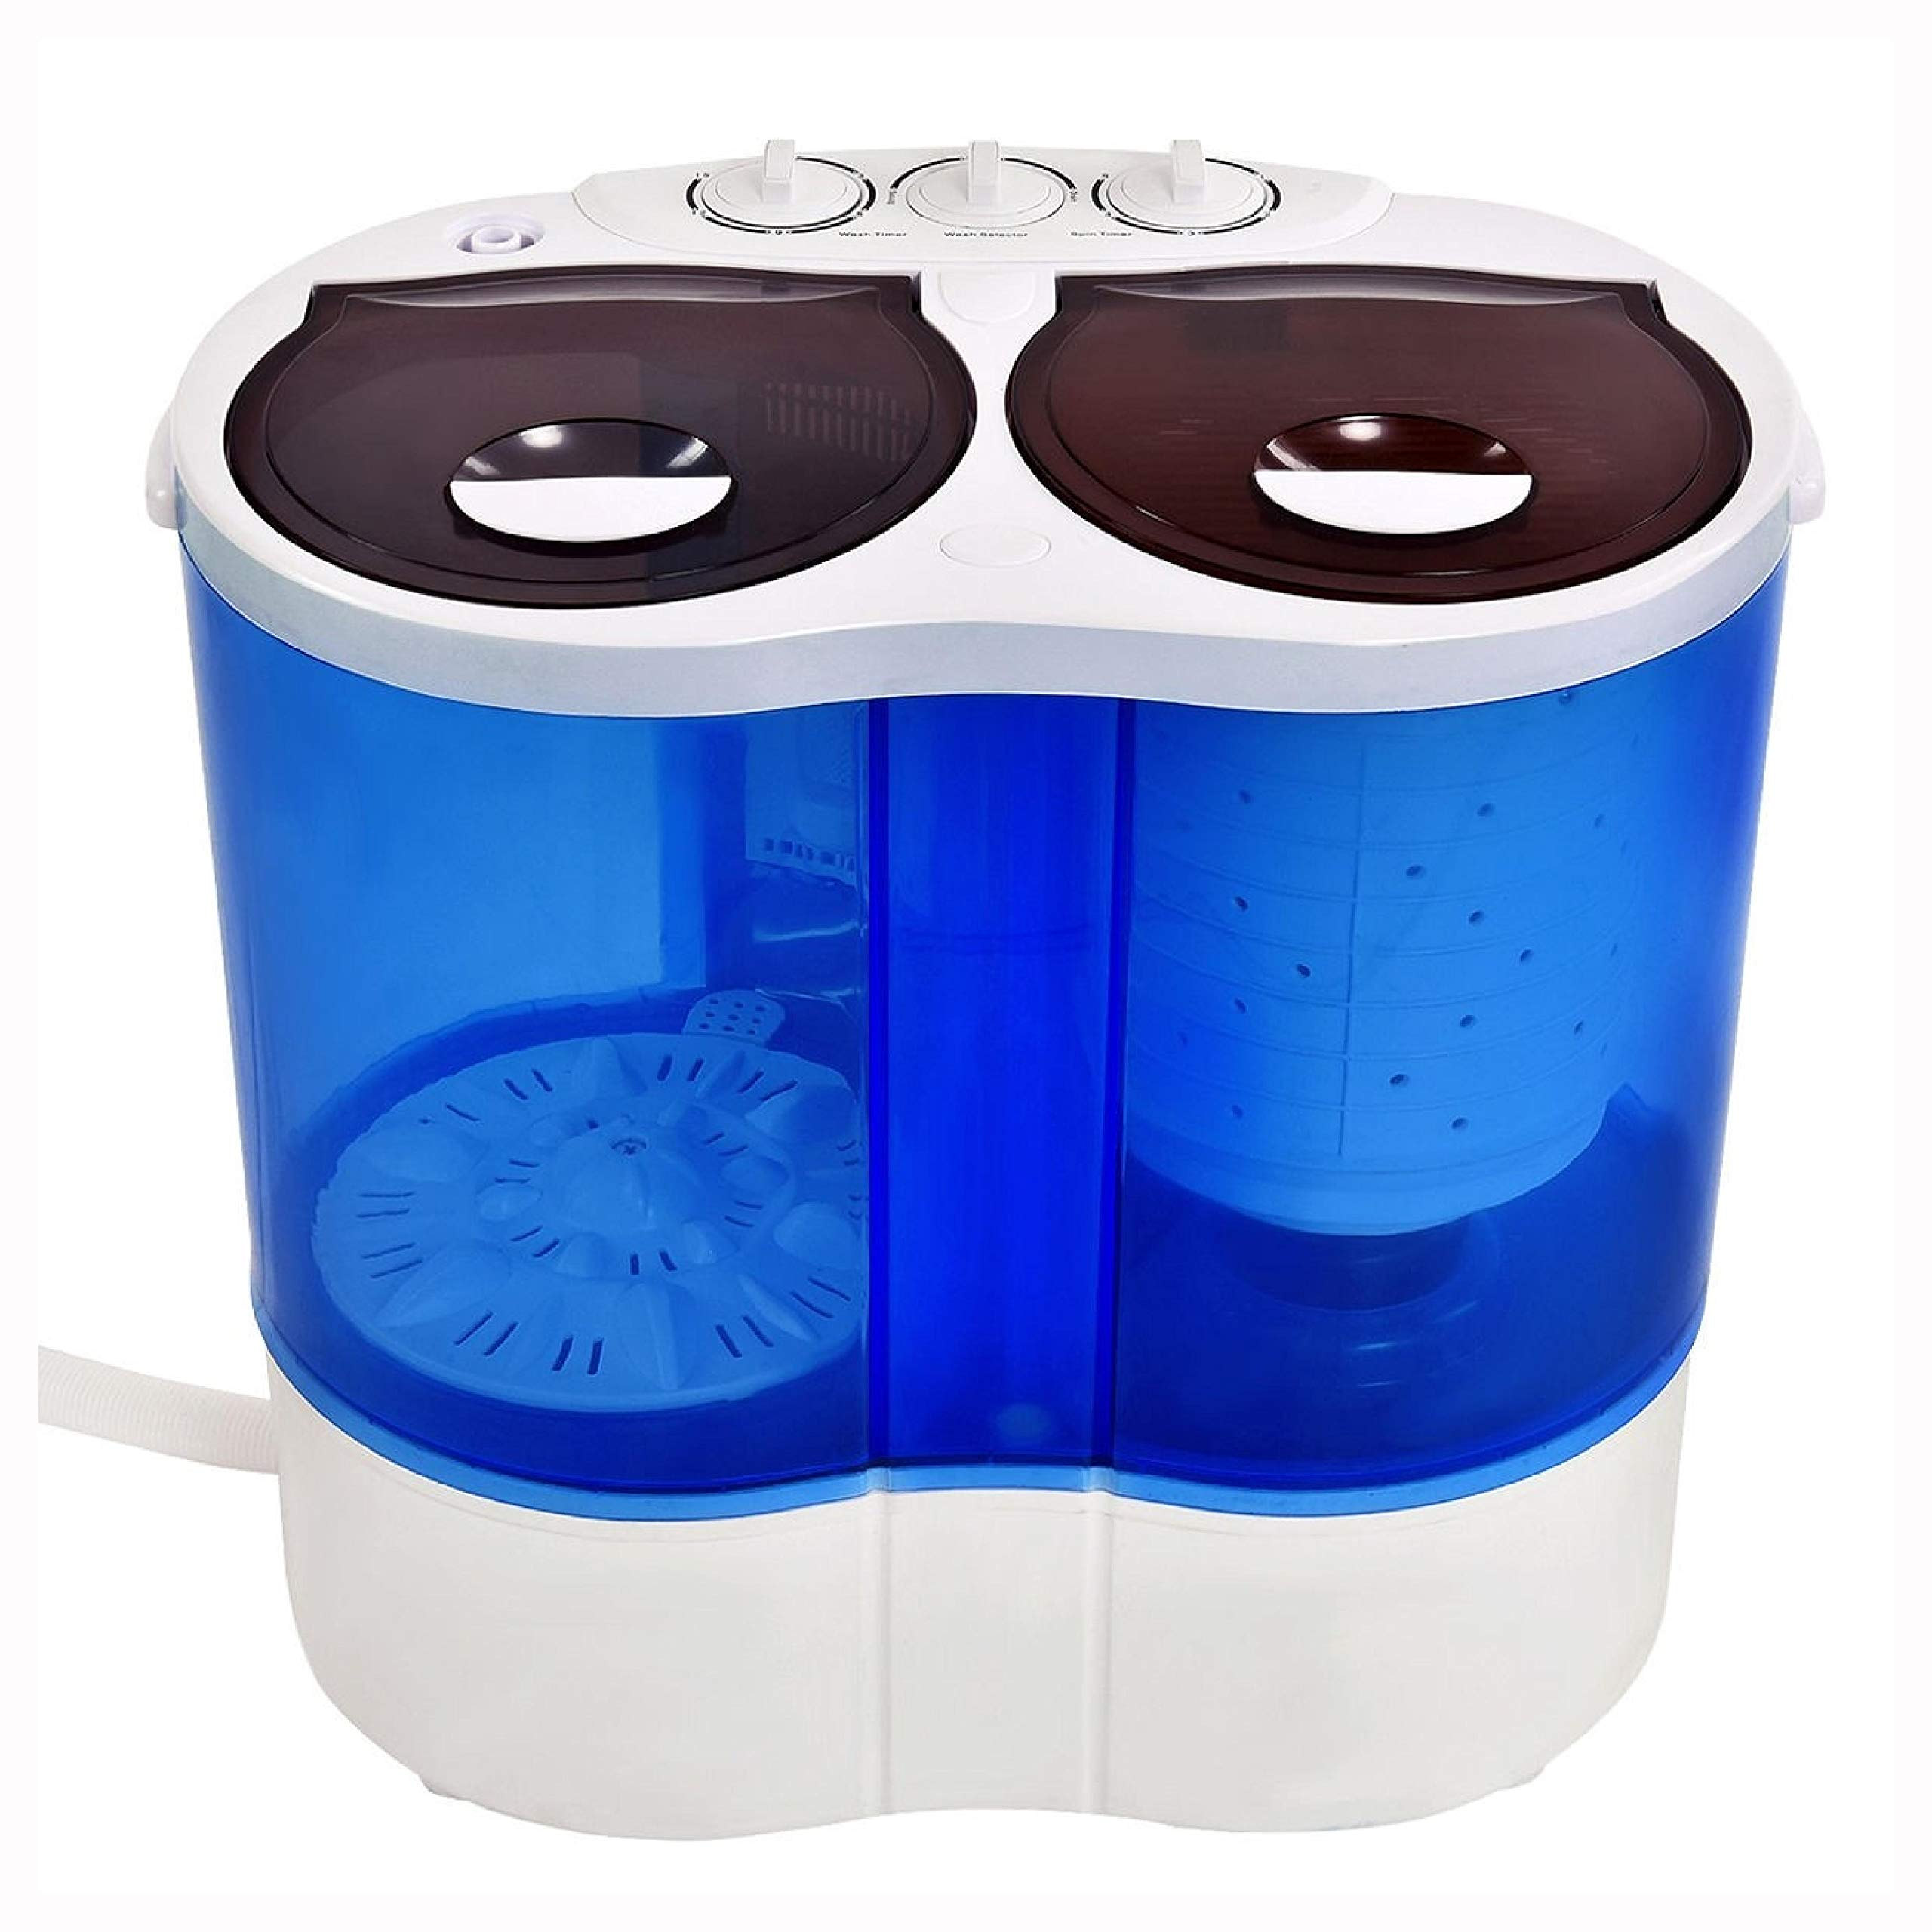 Washing Machine, 15 lbs Portable Compact Twin Tub Mini Washing Machine by HomyDelight (Image #2)